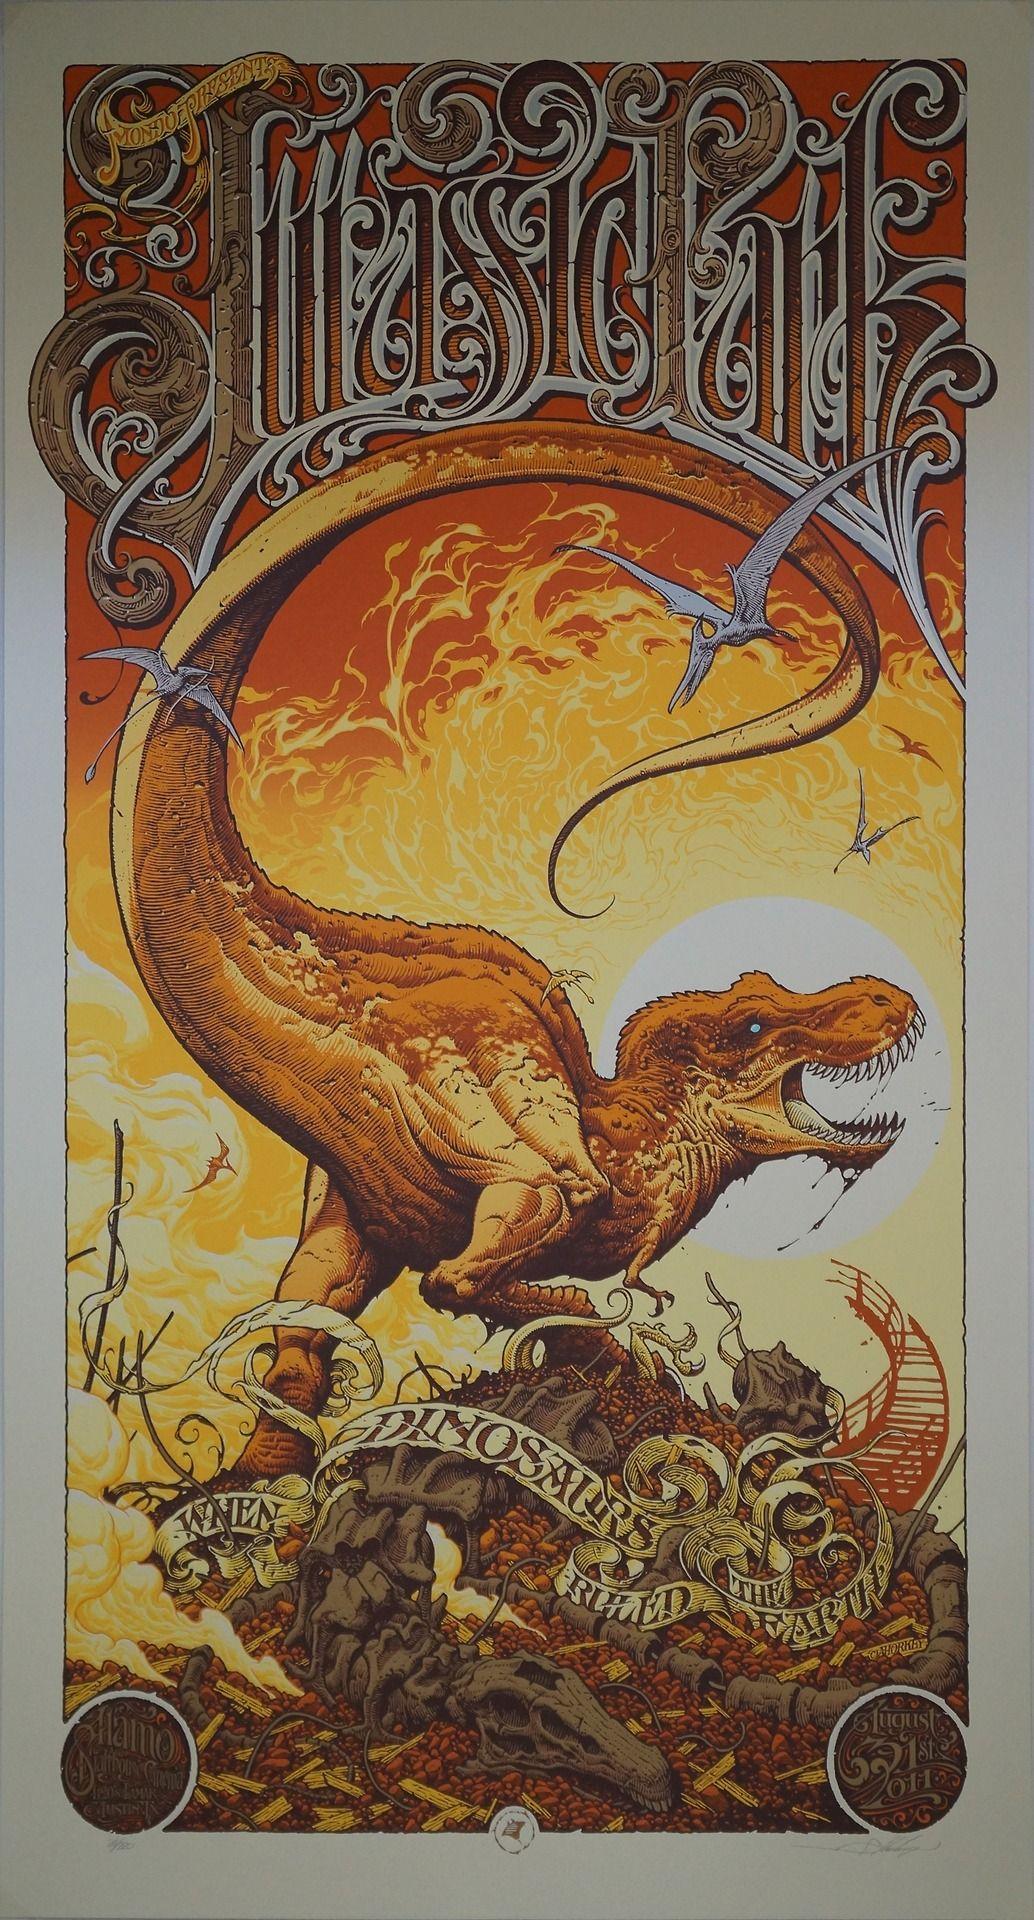 Jurassic Park Poster (Aaron Horkey)